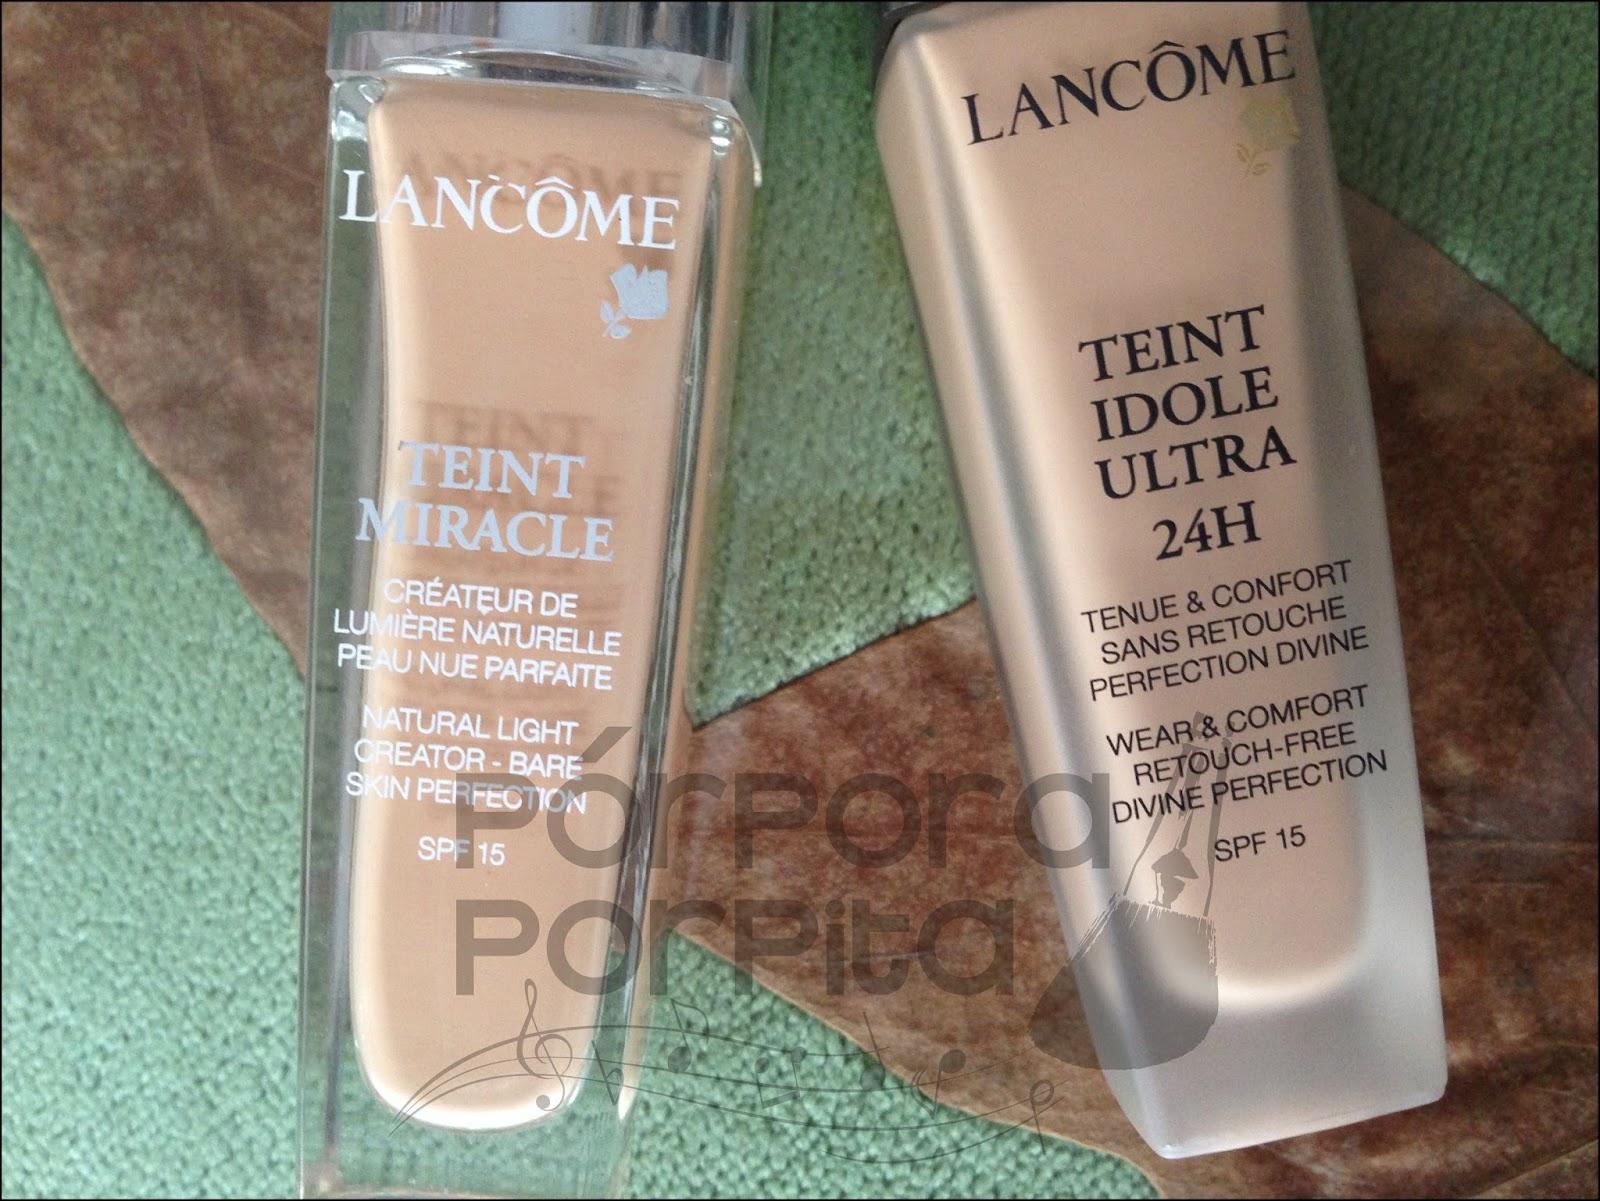 Review comparativa Base Teint Miracle y Teint Idole de Lancôme